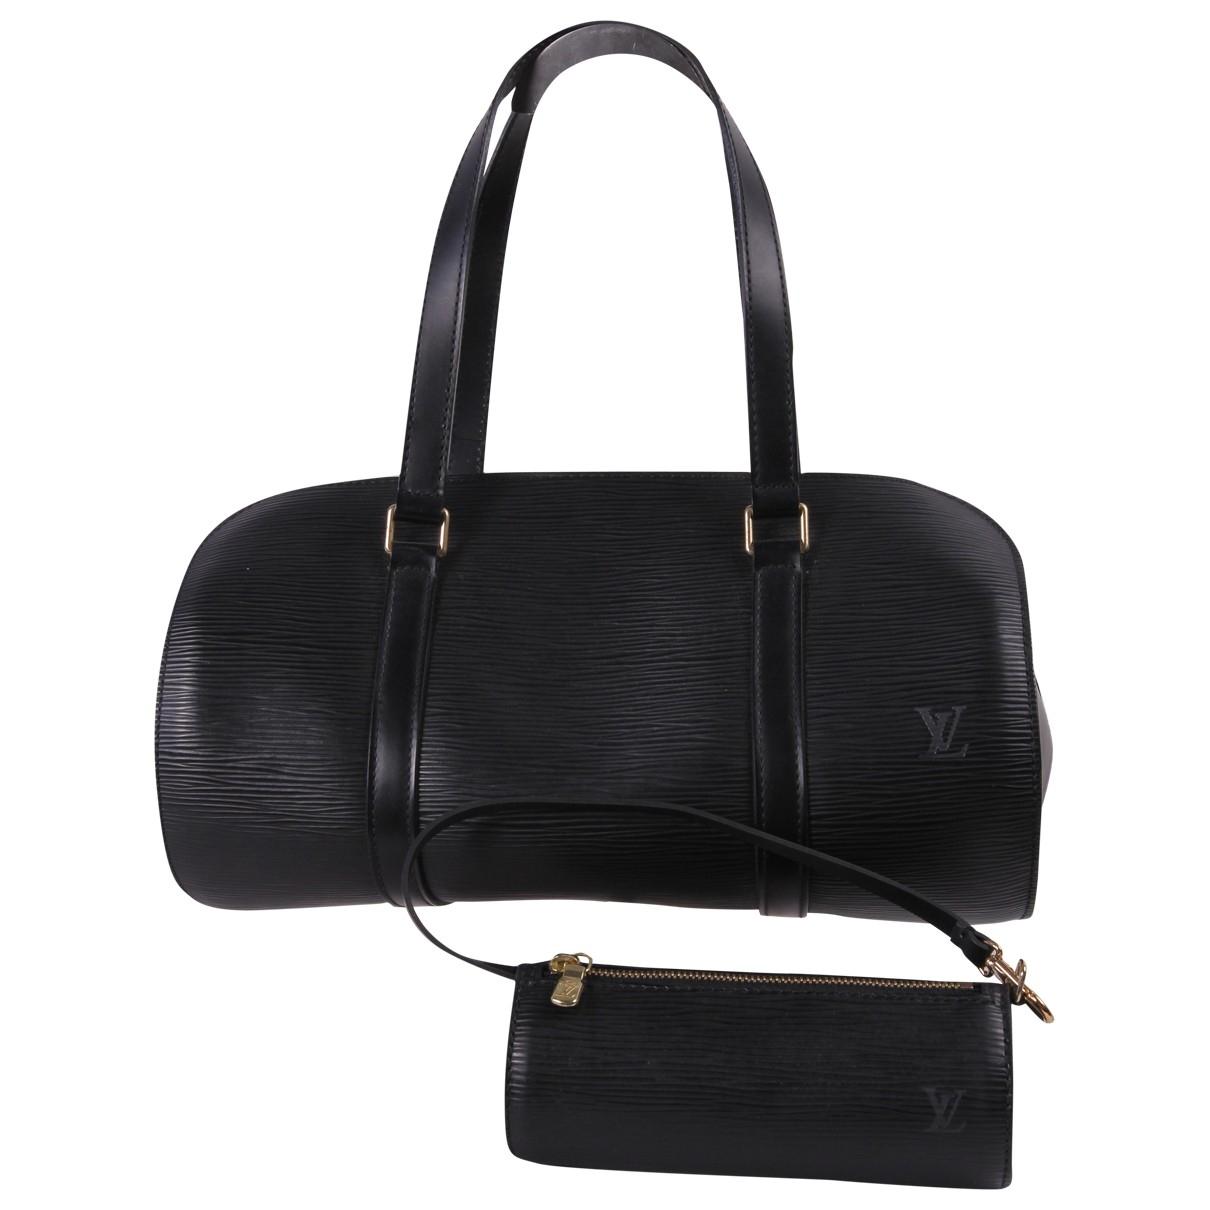 Louis Vuitton Soufflot Handtasche in  Schwarz Leder